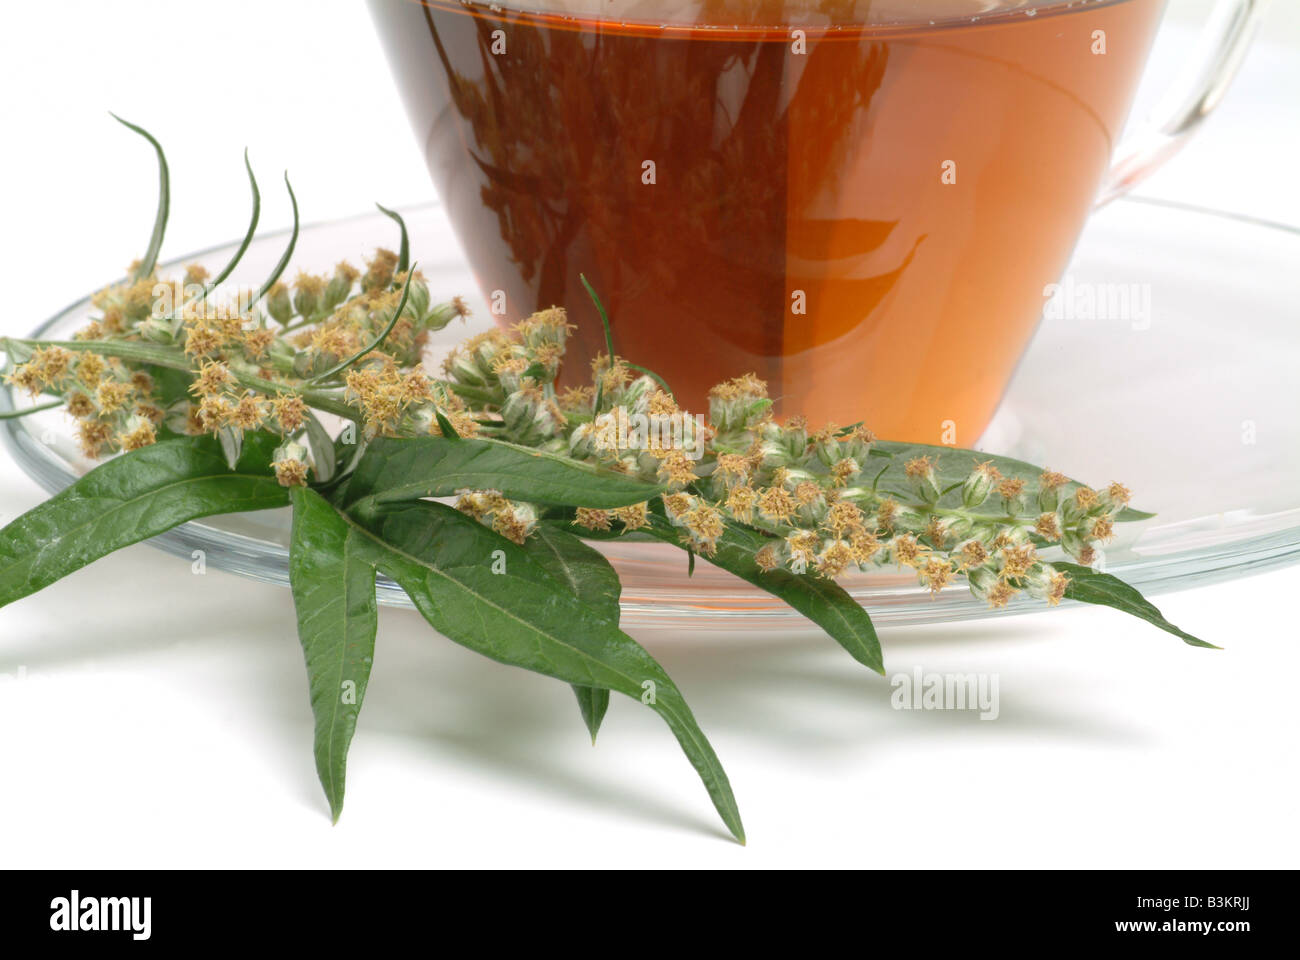 Medicinal herb tea and Blossom of the medicinal plant